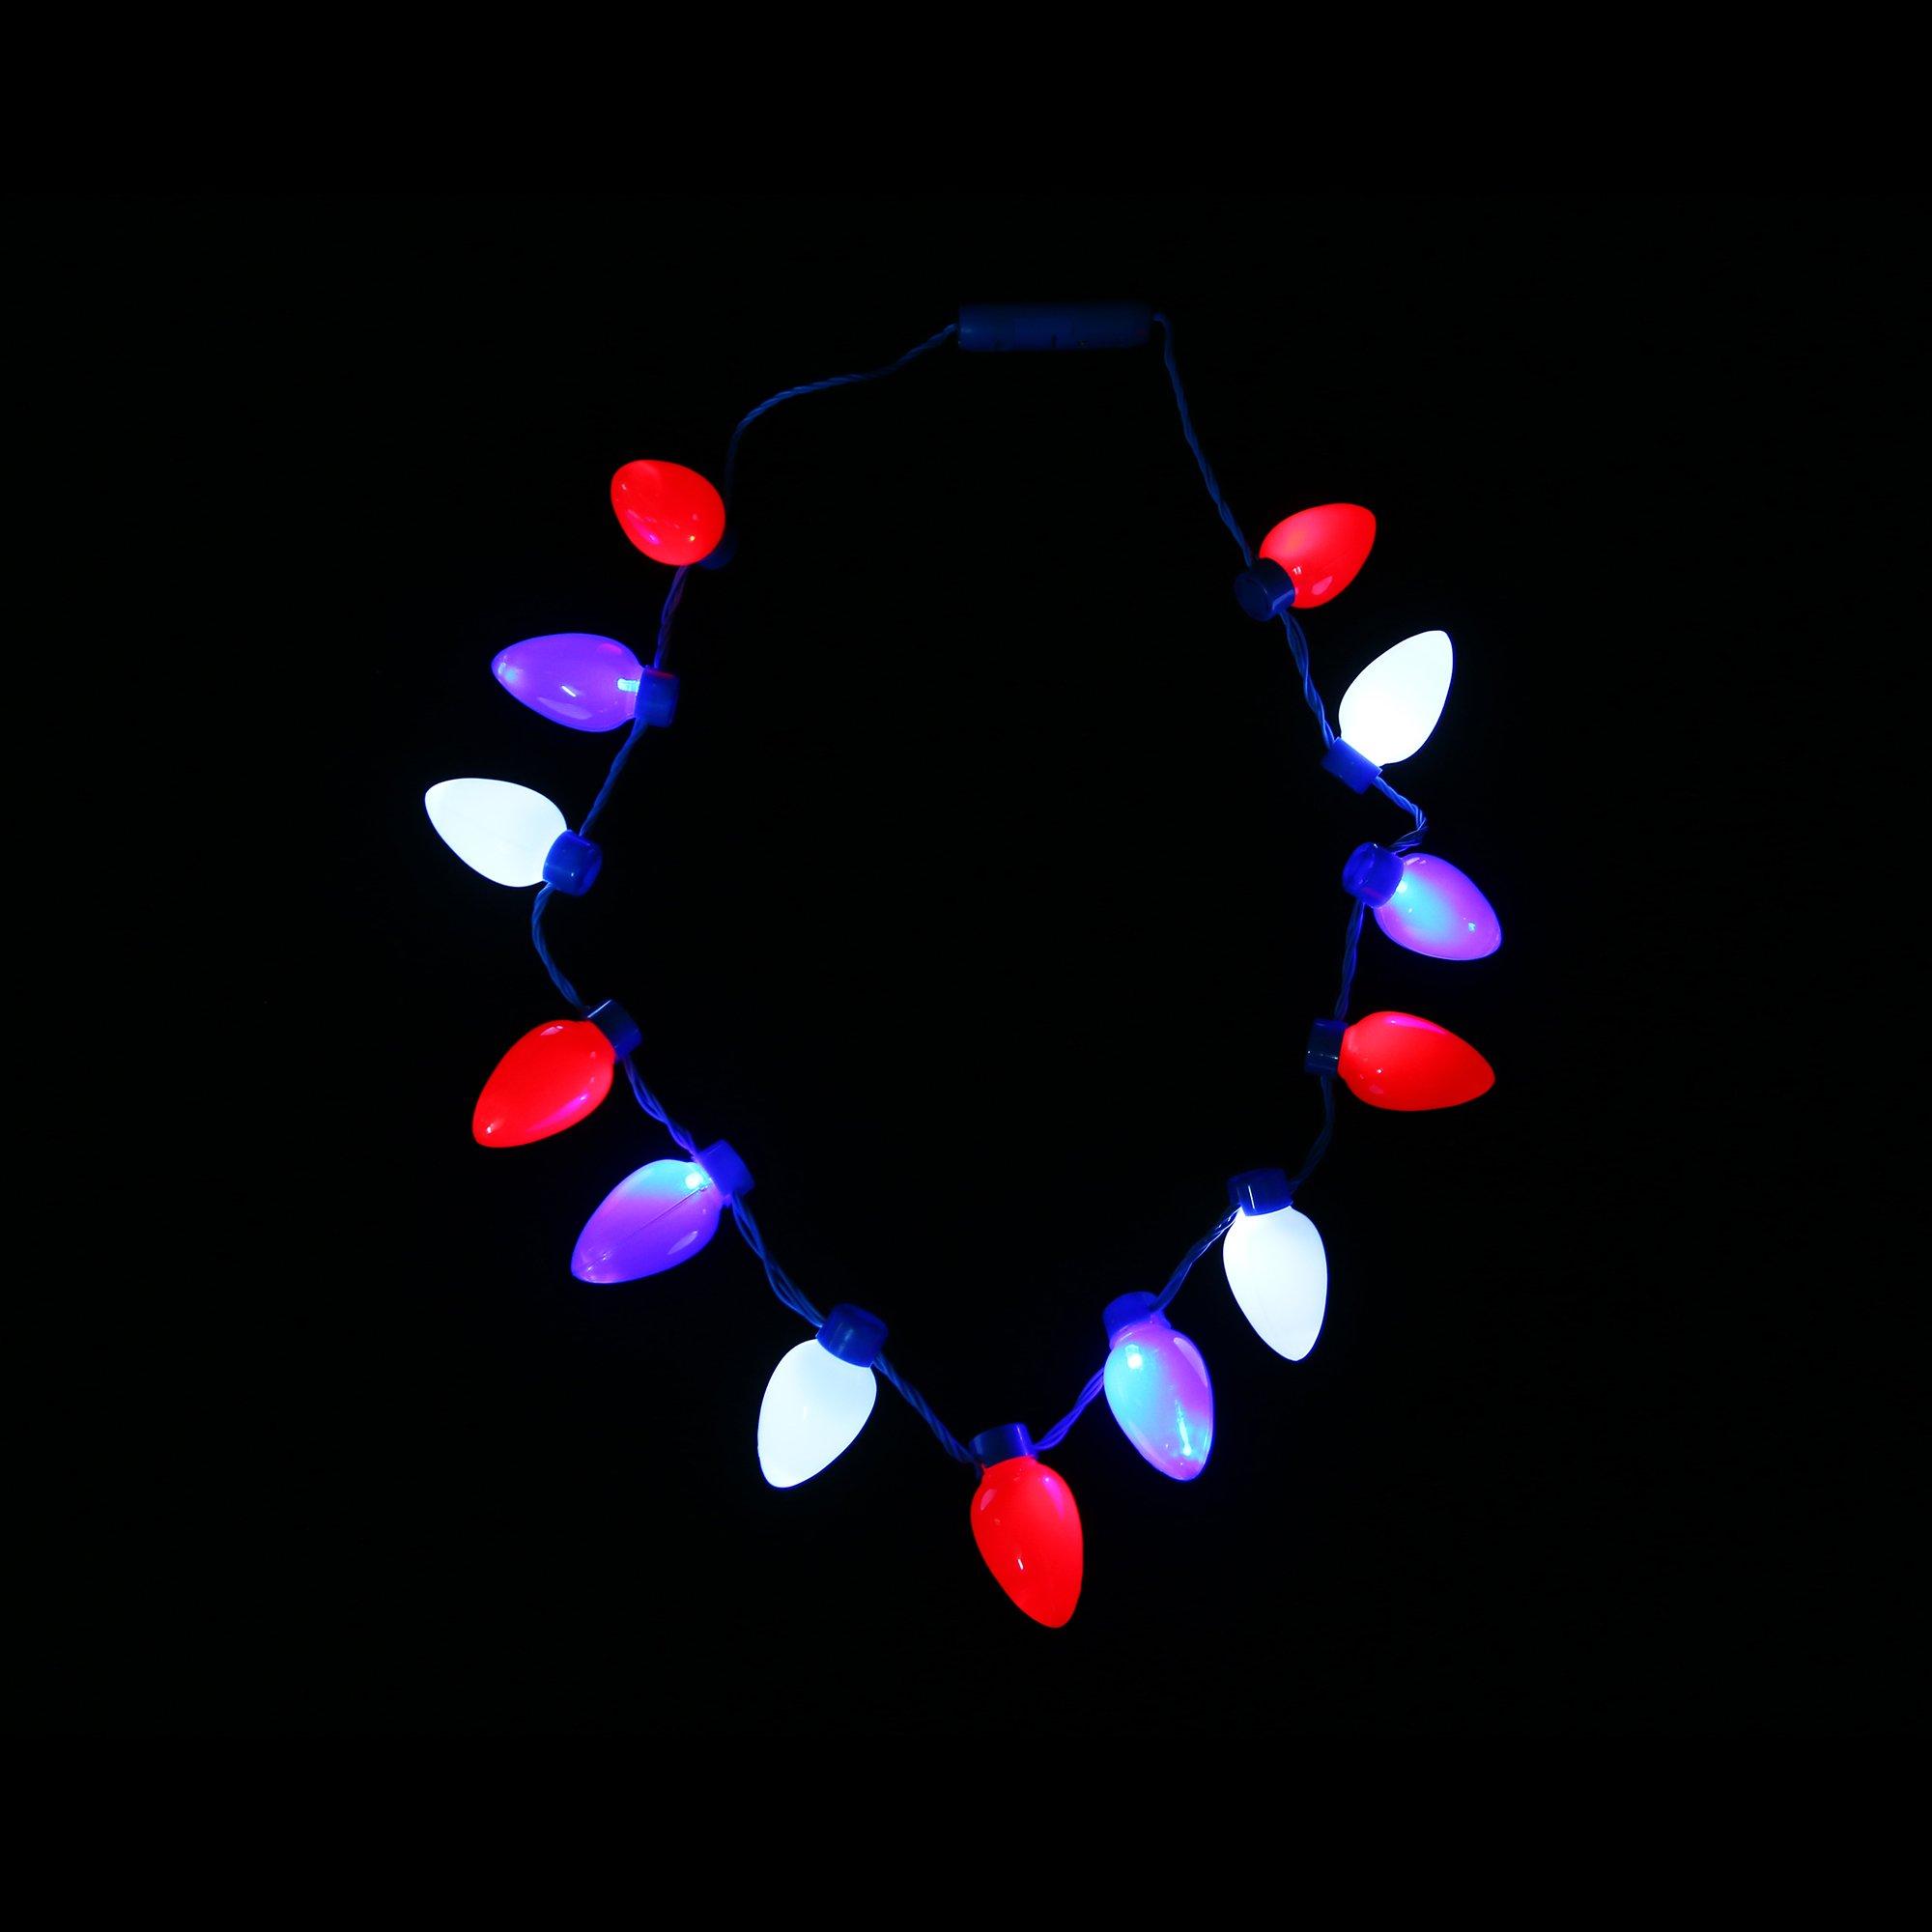 Fun Central AM613 12 pcs LED Light Up Bead Necklace Flashing Lights Necklace-Assorted LED Necklace Long Beaded Necklace Flashing Light Glow in the Dark Necklace Glow Bead Necklace